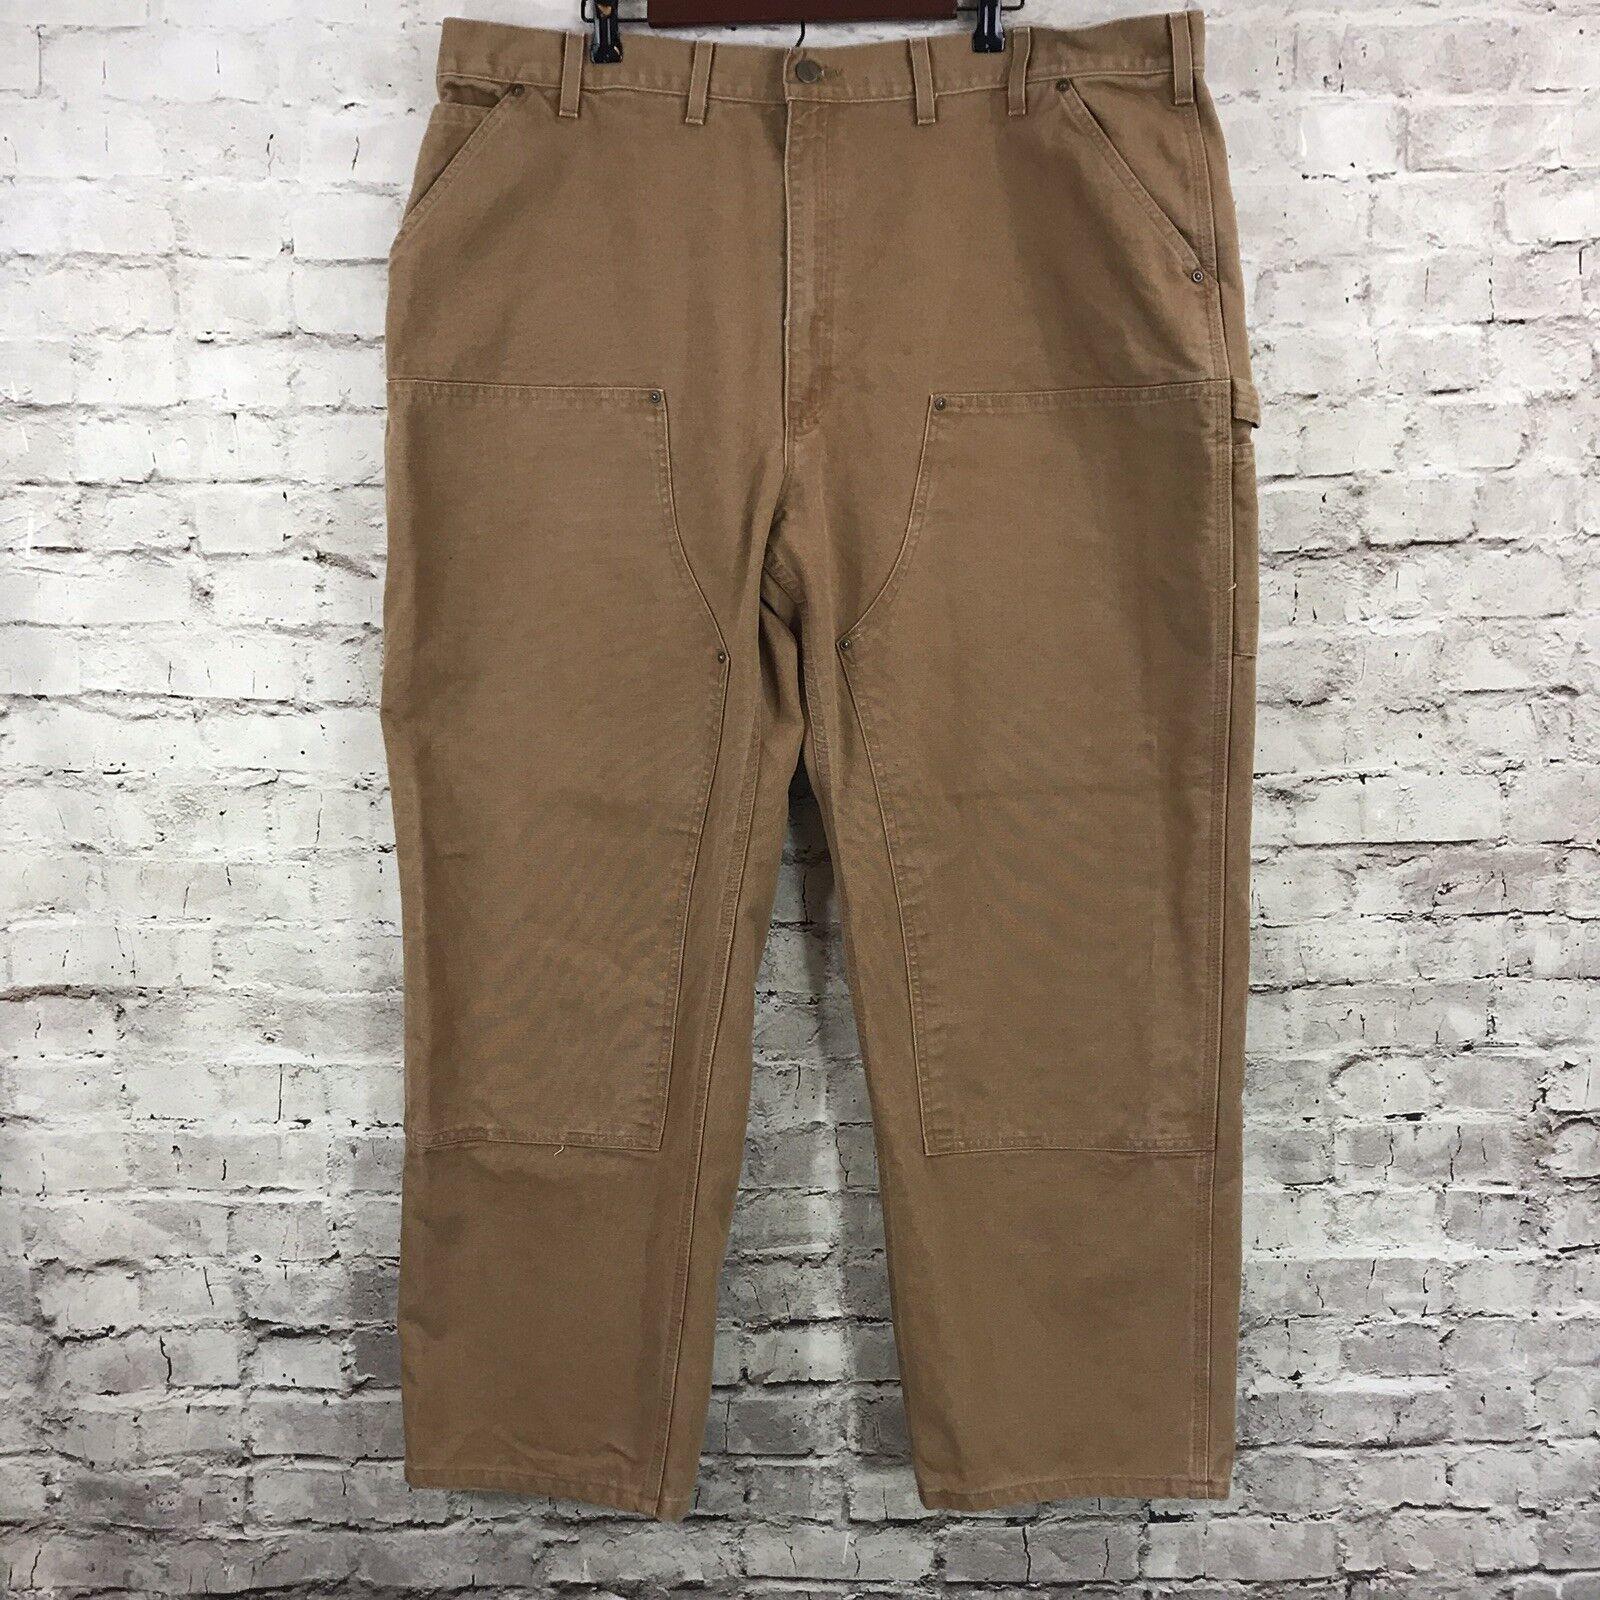 Carhartt Mens Carpenter Double Front Canvas Brown Work Pants 46 x 32 -RN 14806